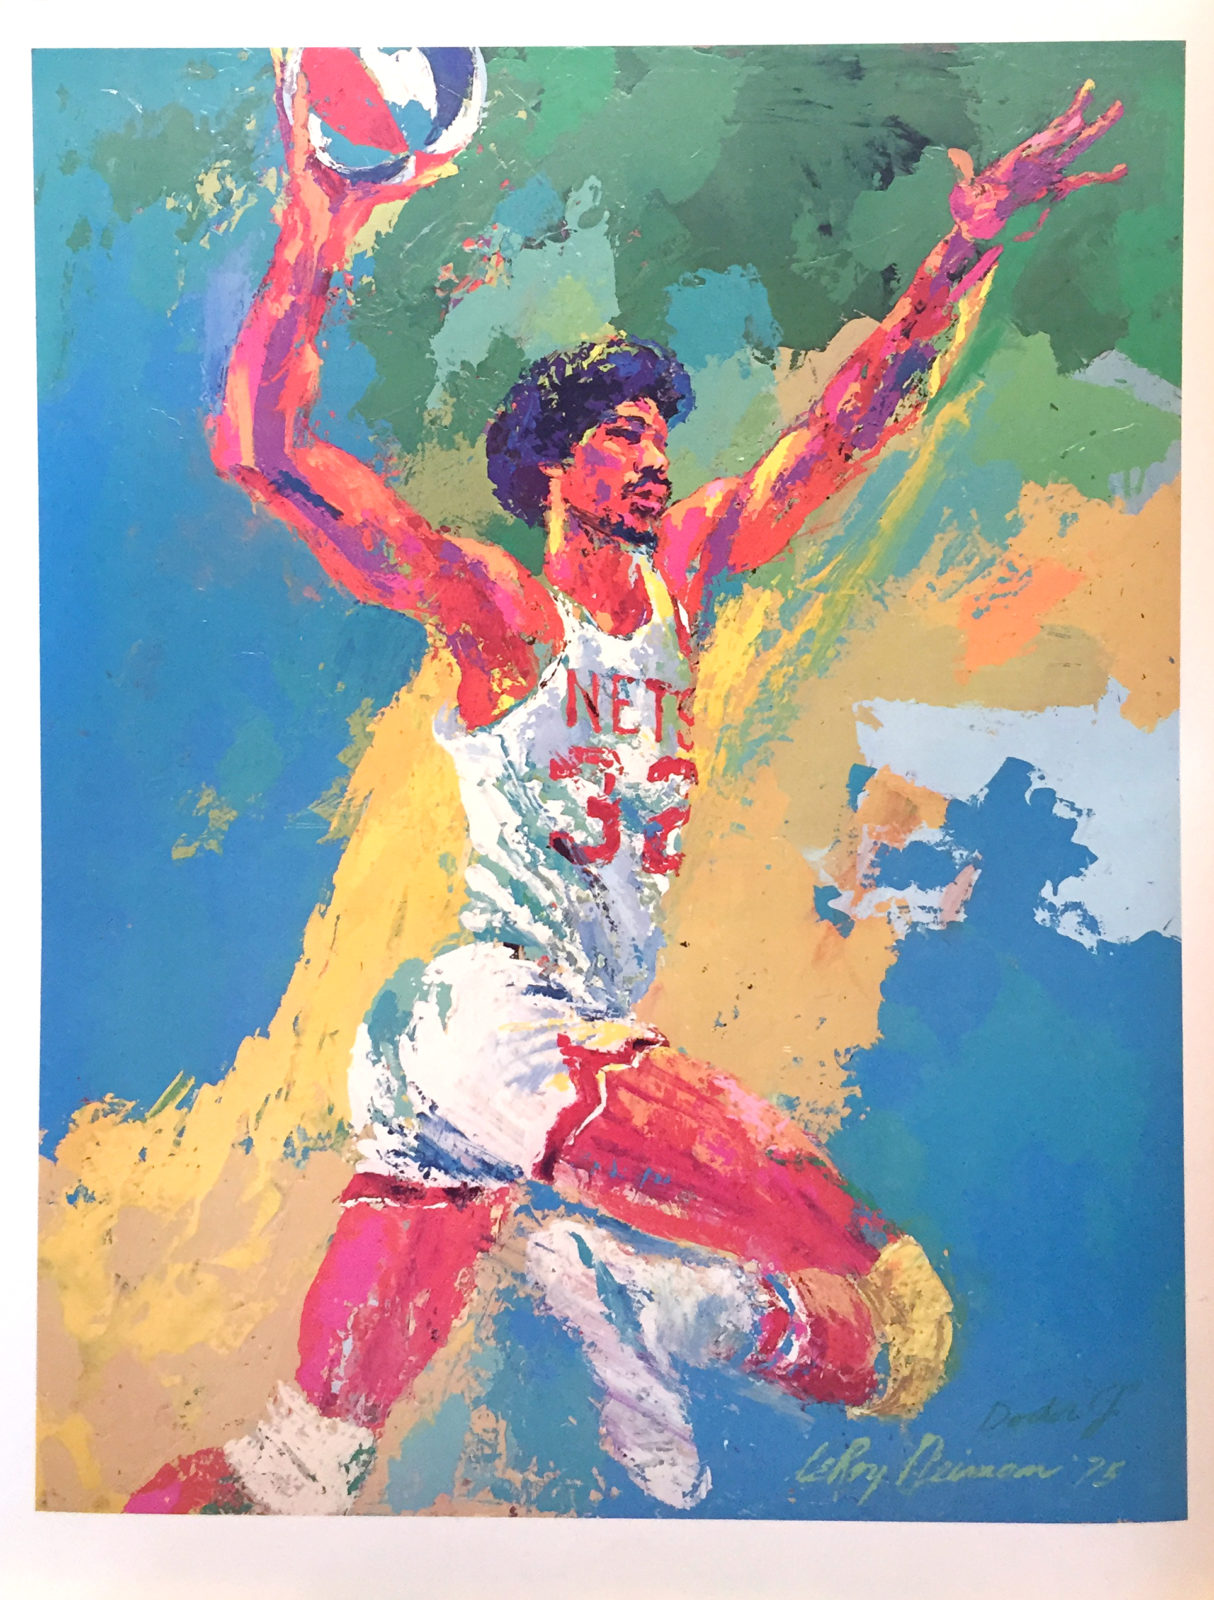 Dr. J Basketball poster